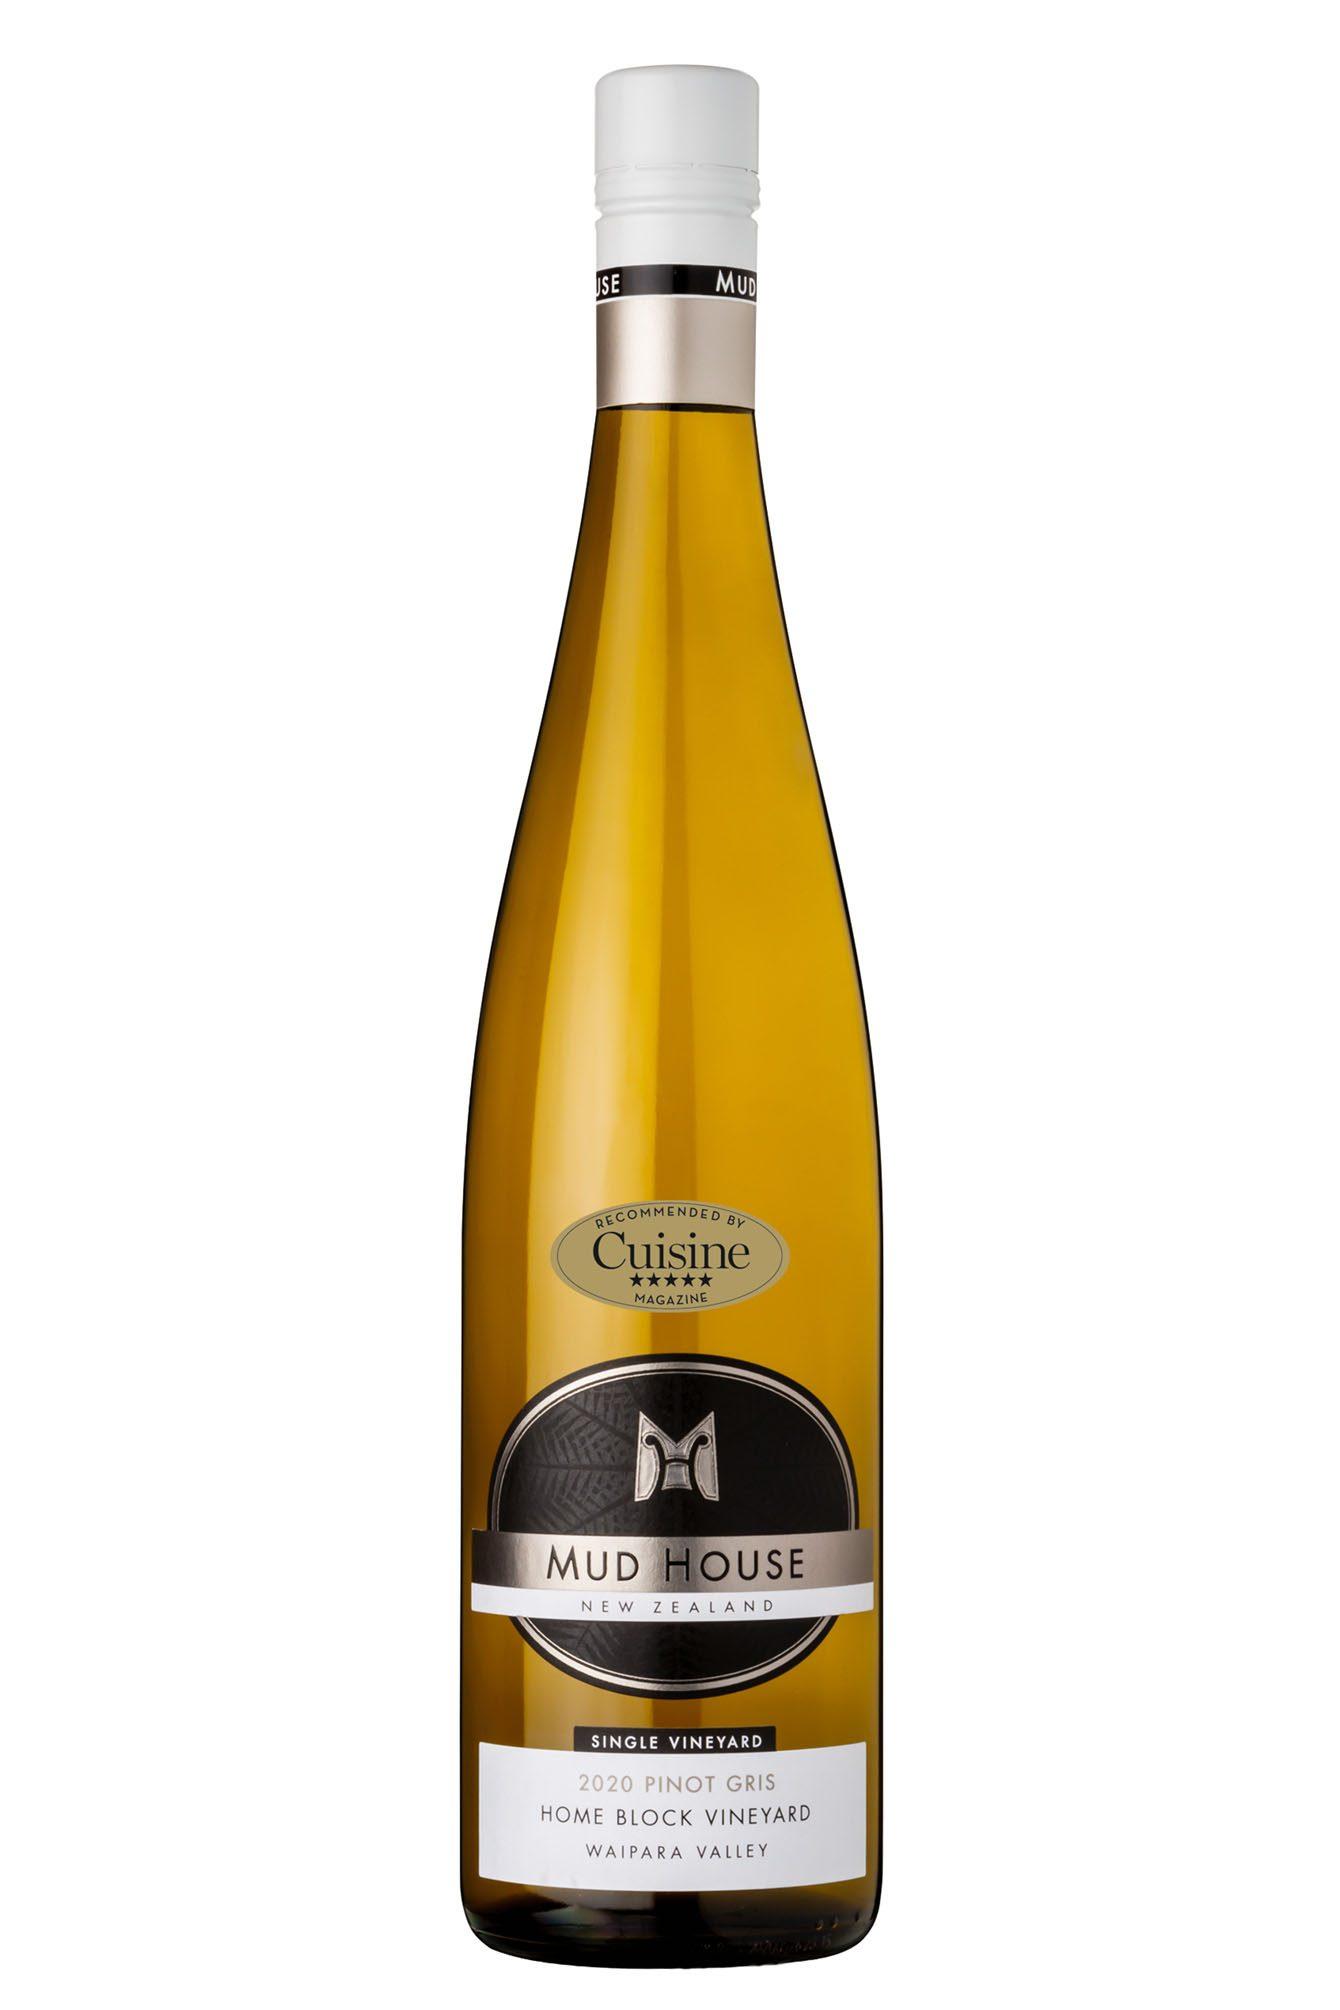 Mud House Single Vineyard Home Block Waipara Valley Pinot Gris 2020